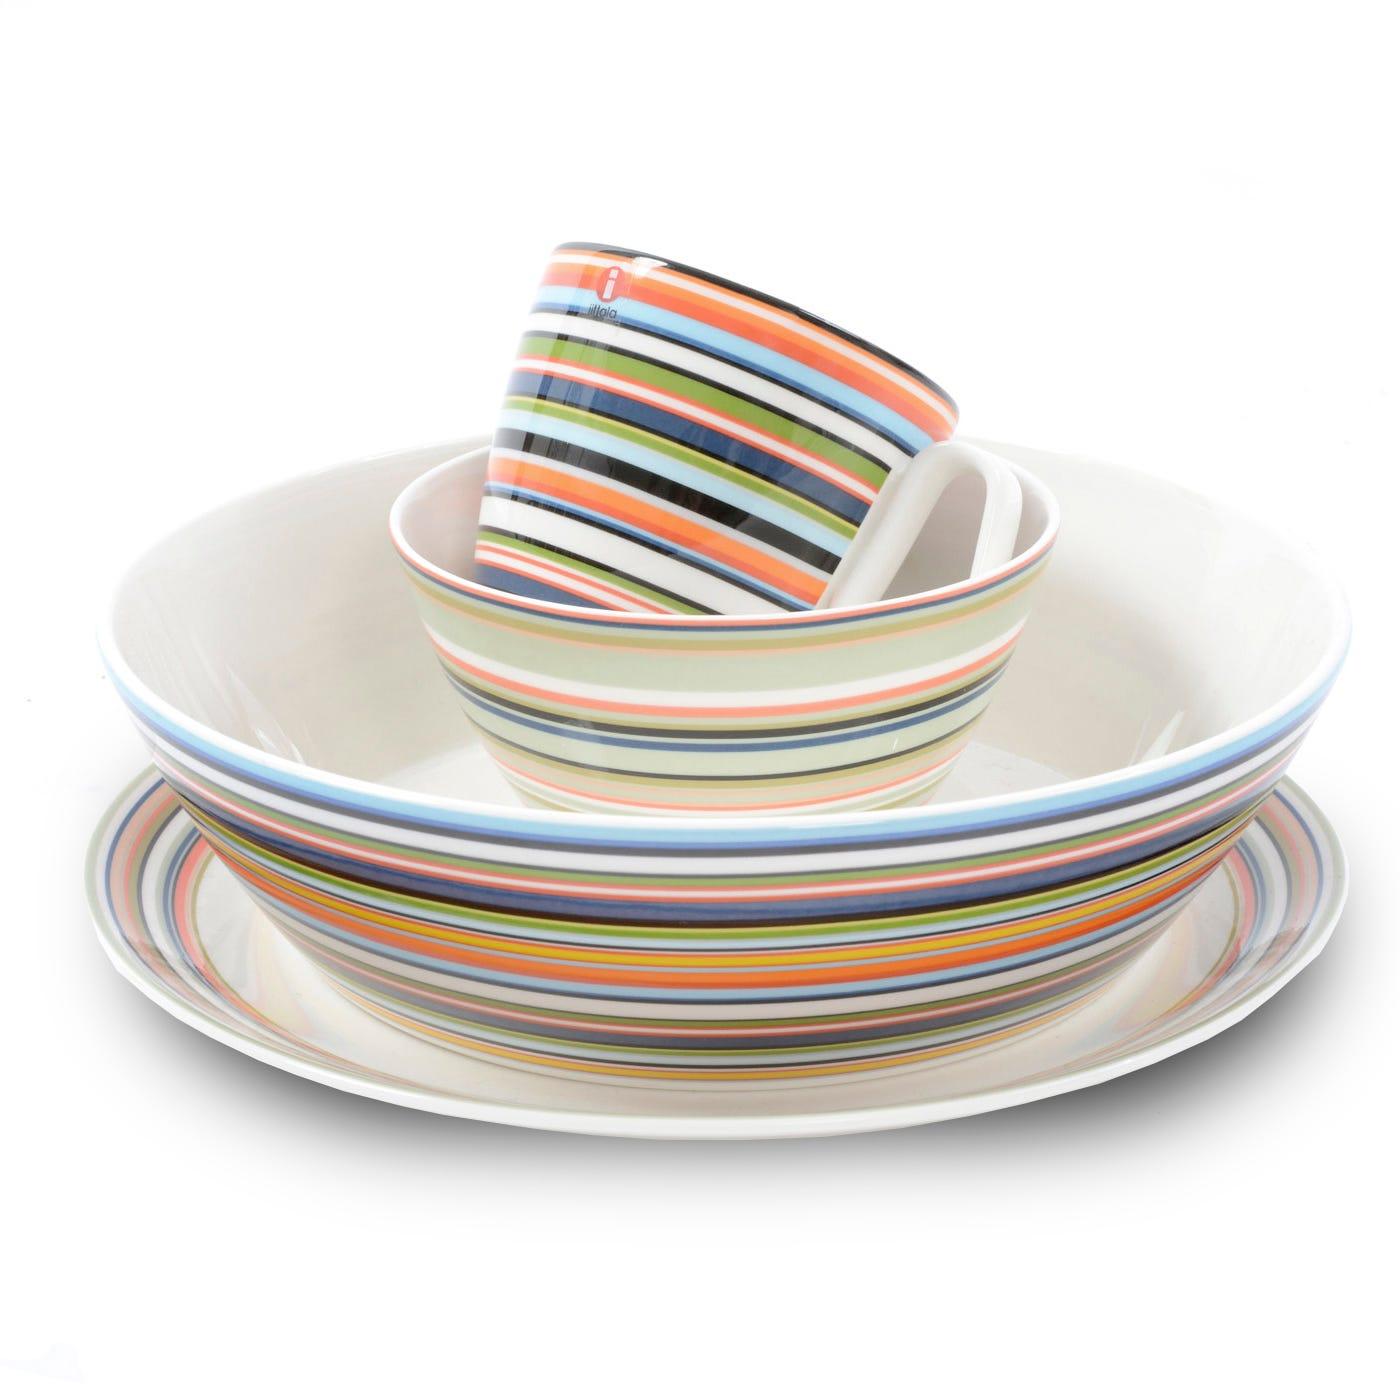 Iittala Origio Dinnerware